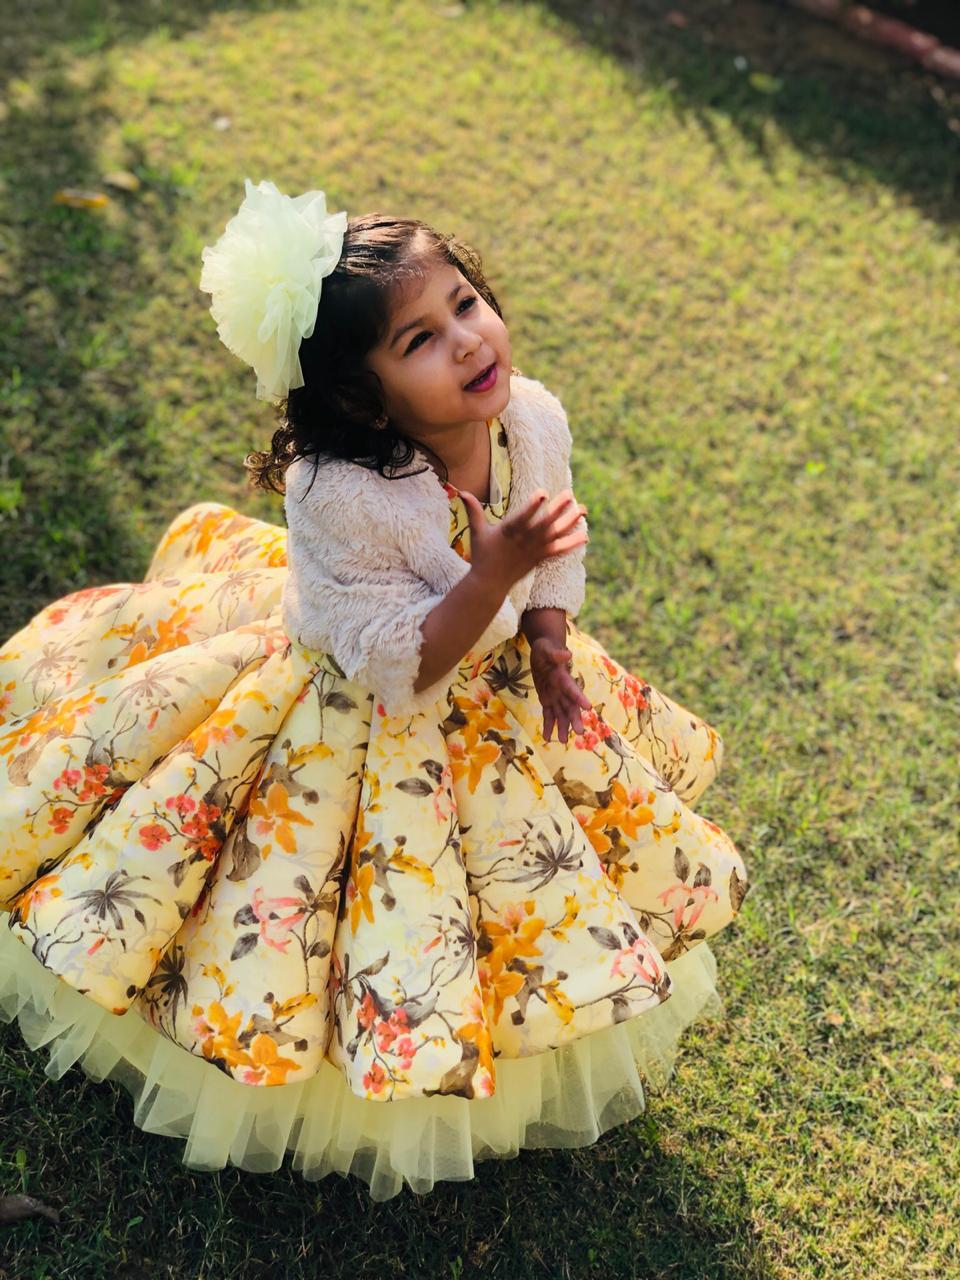 birthday dress for girl baby (6)